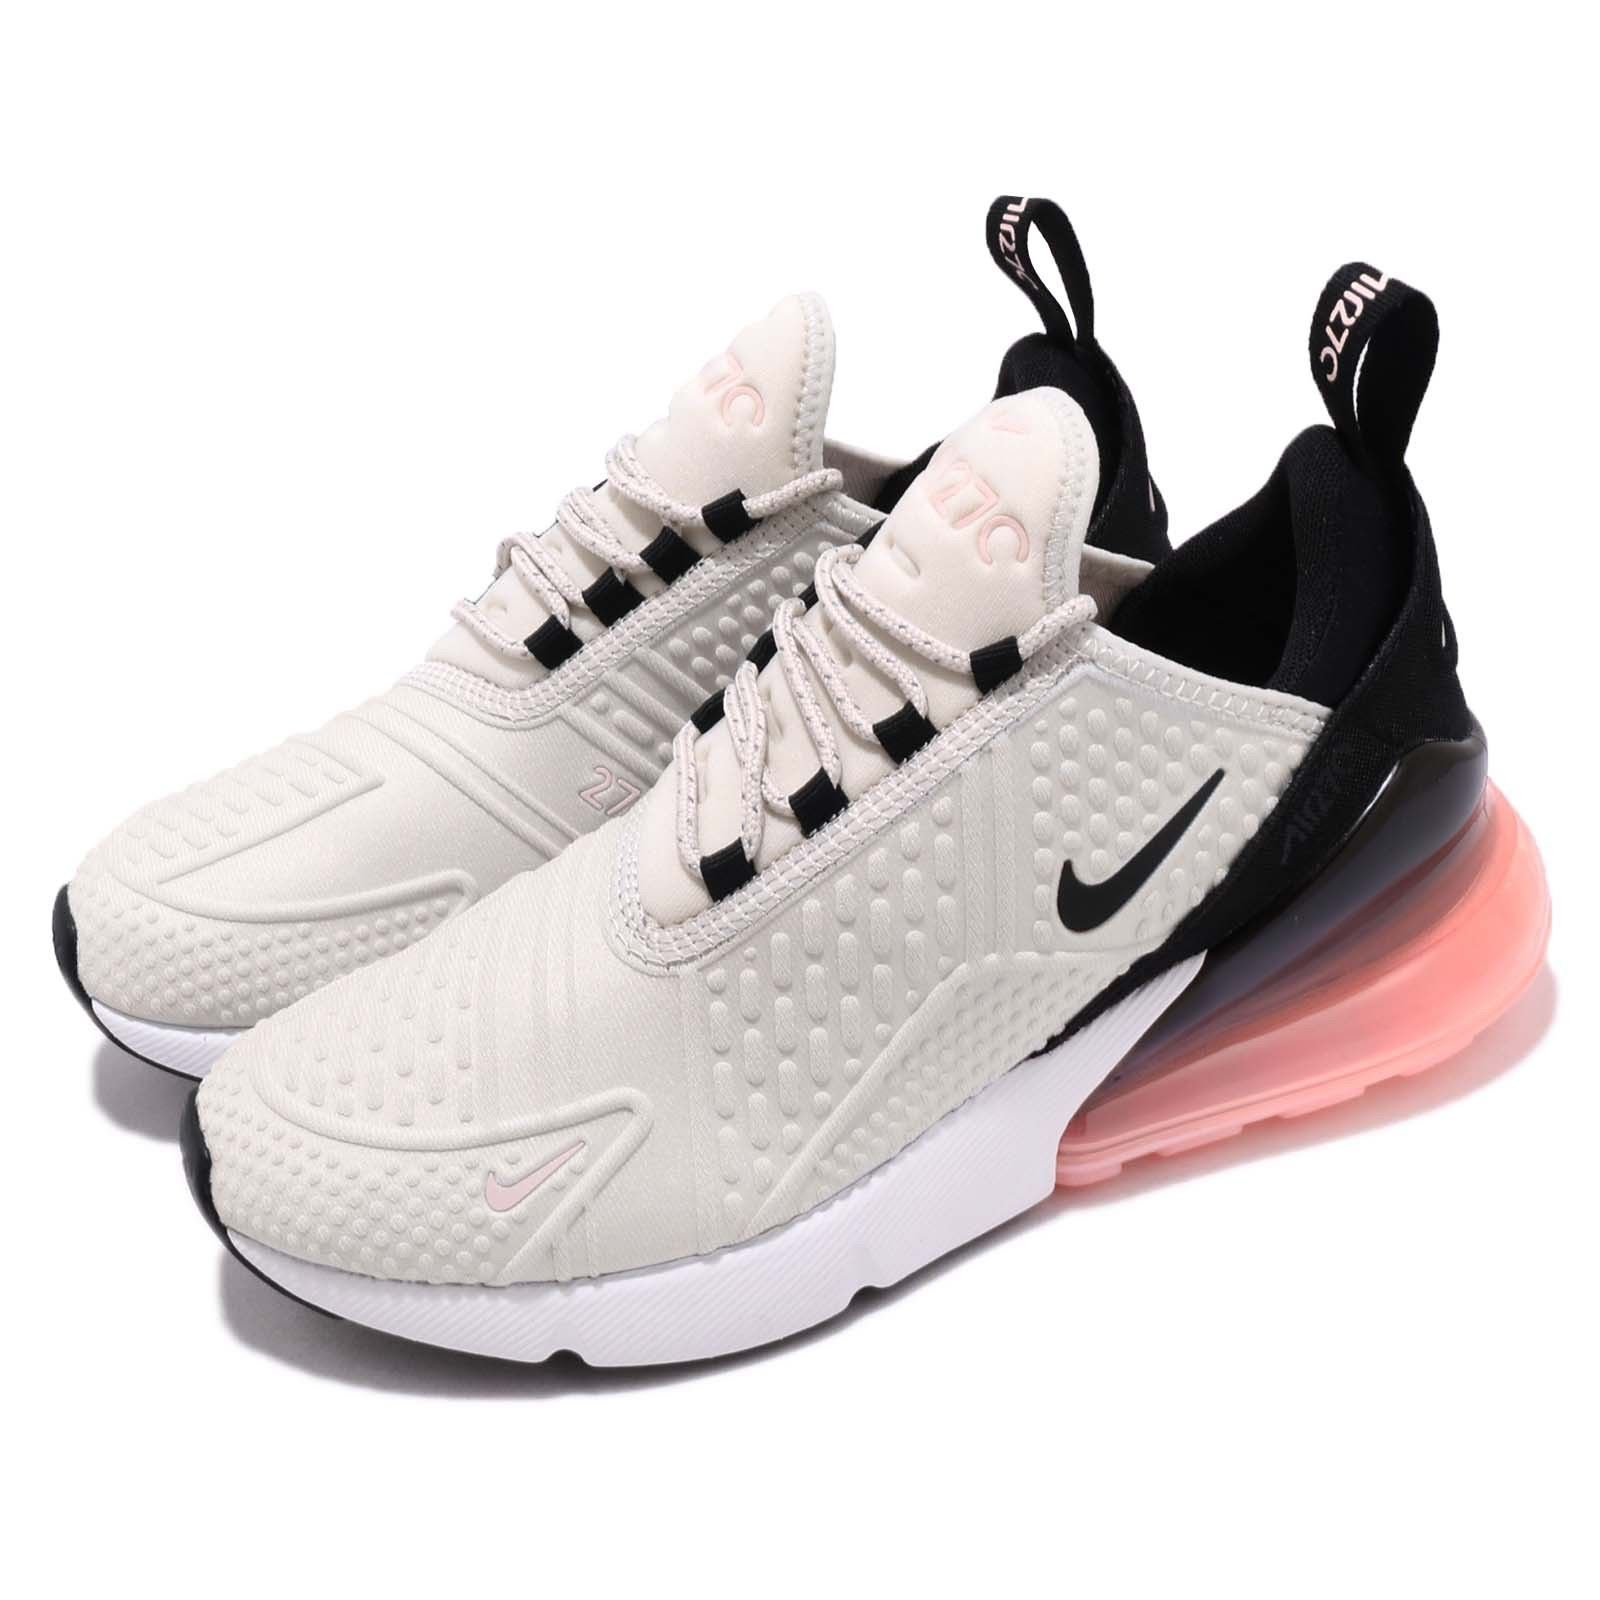 Nike Wmns Airmax Light Bone Black Pink Women Running Shoes Womens Running Shoes Nike Shoes Outfits Tennis Shoes Outfit